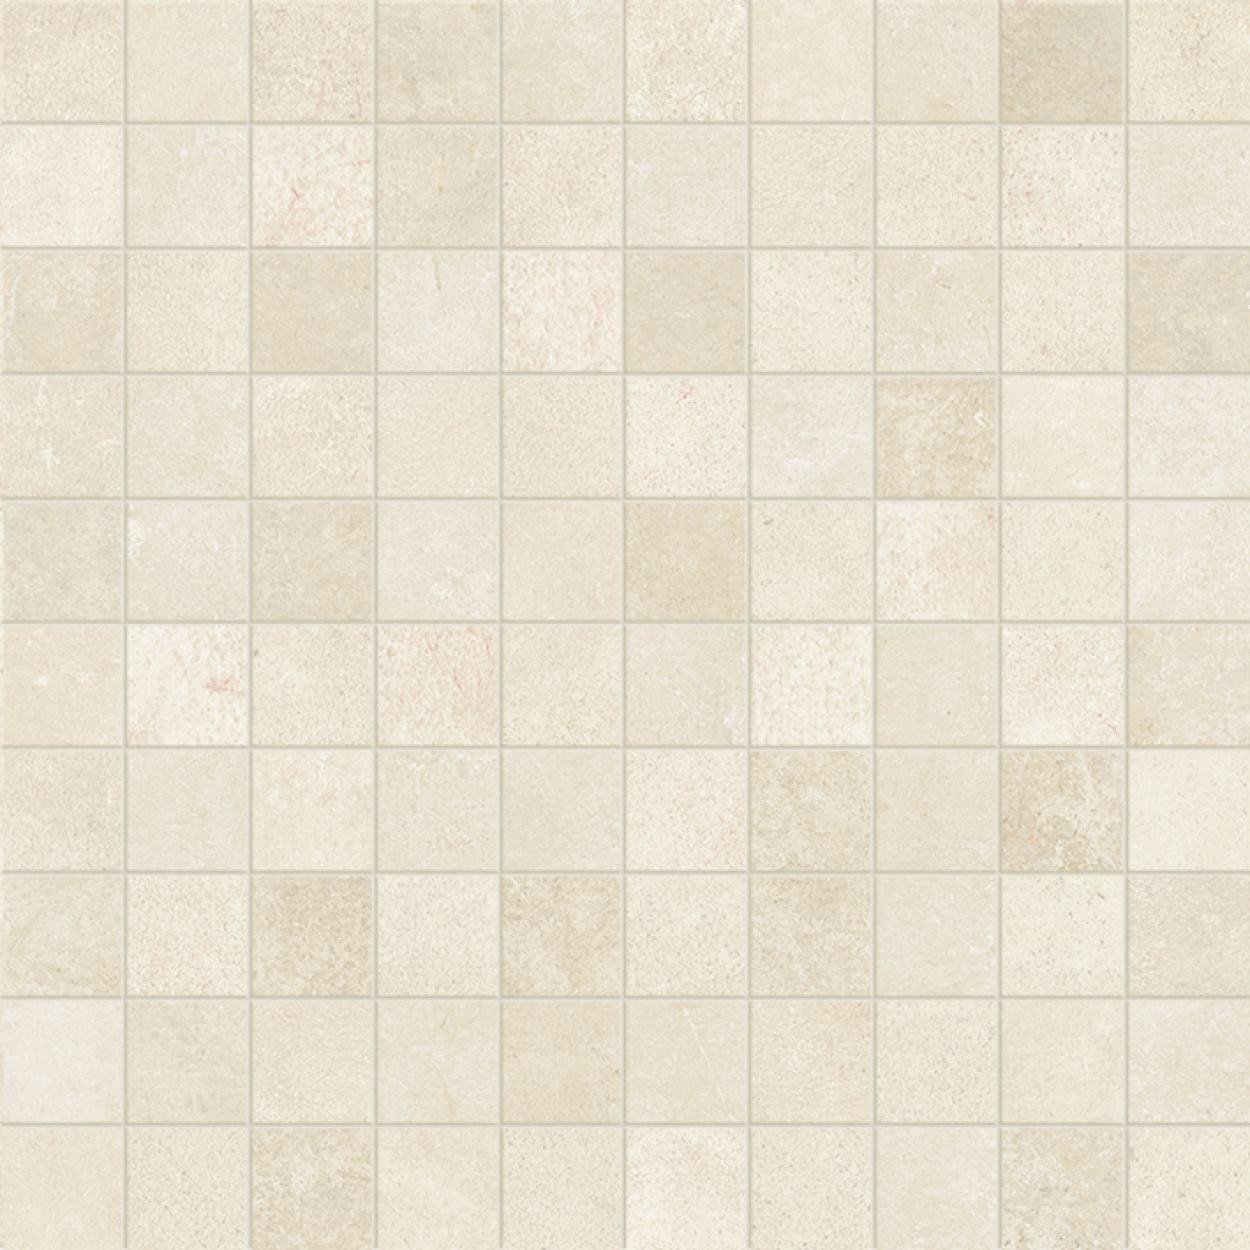 1 x 1 Midtown Soho mosaic